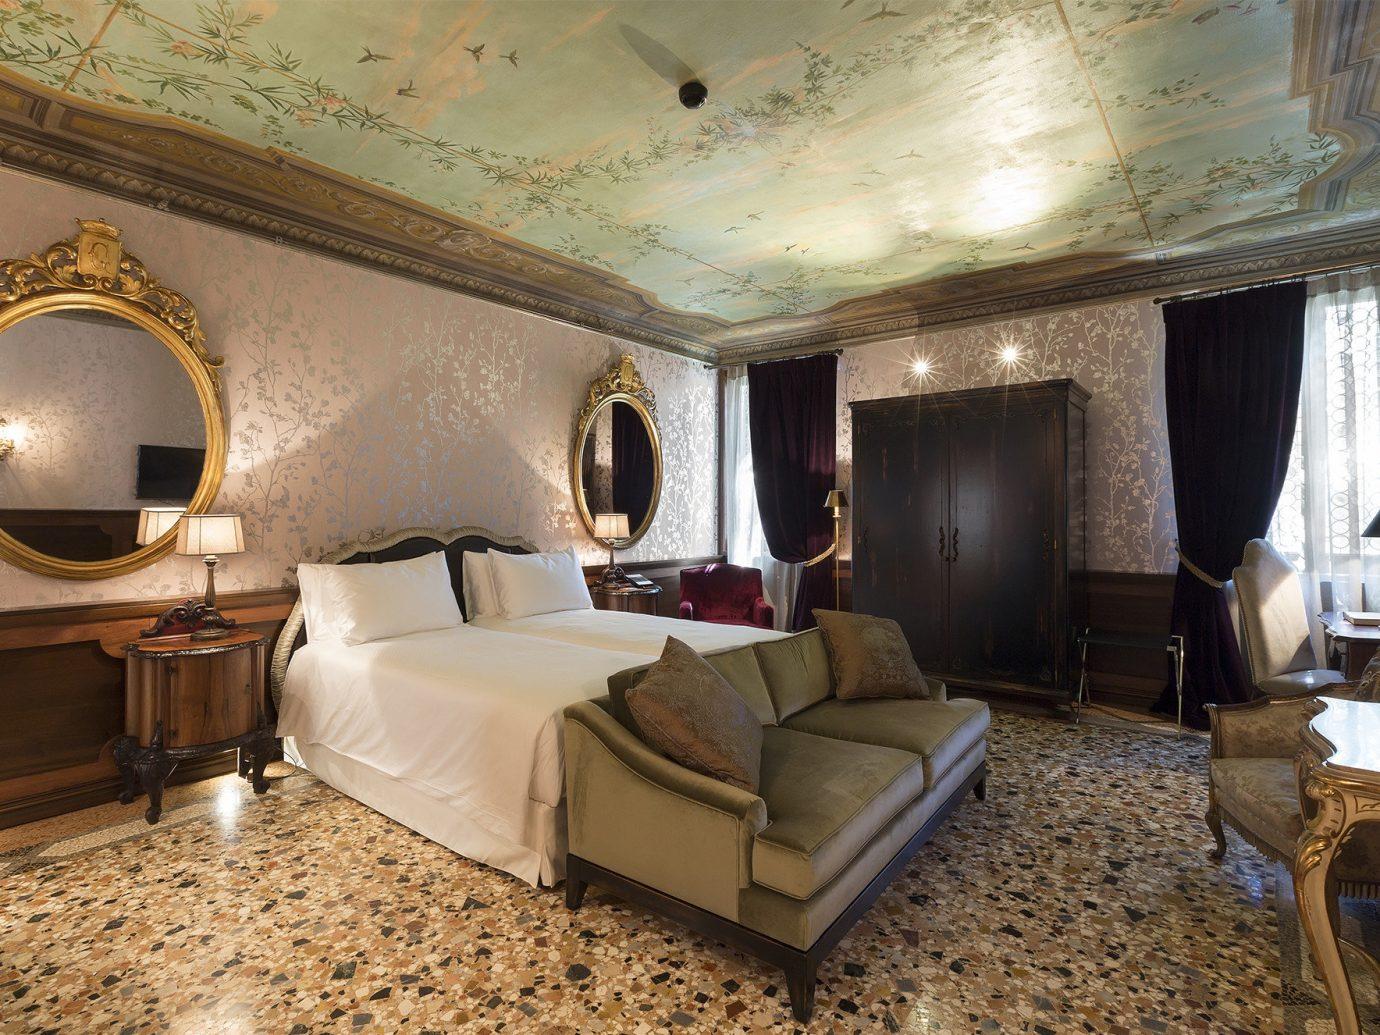 Hotels Italy Luxury Travel Venice indoor wall floor room ceiling Suite interior design estate hotel living room Bedroom furniture